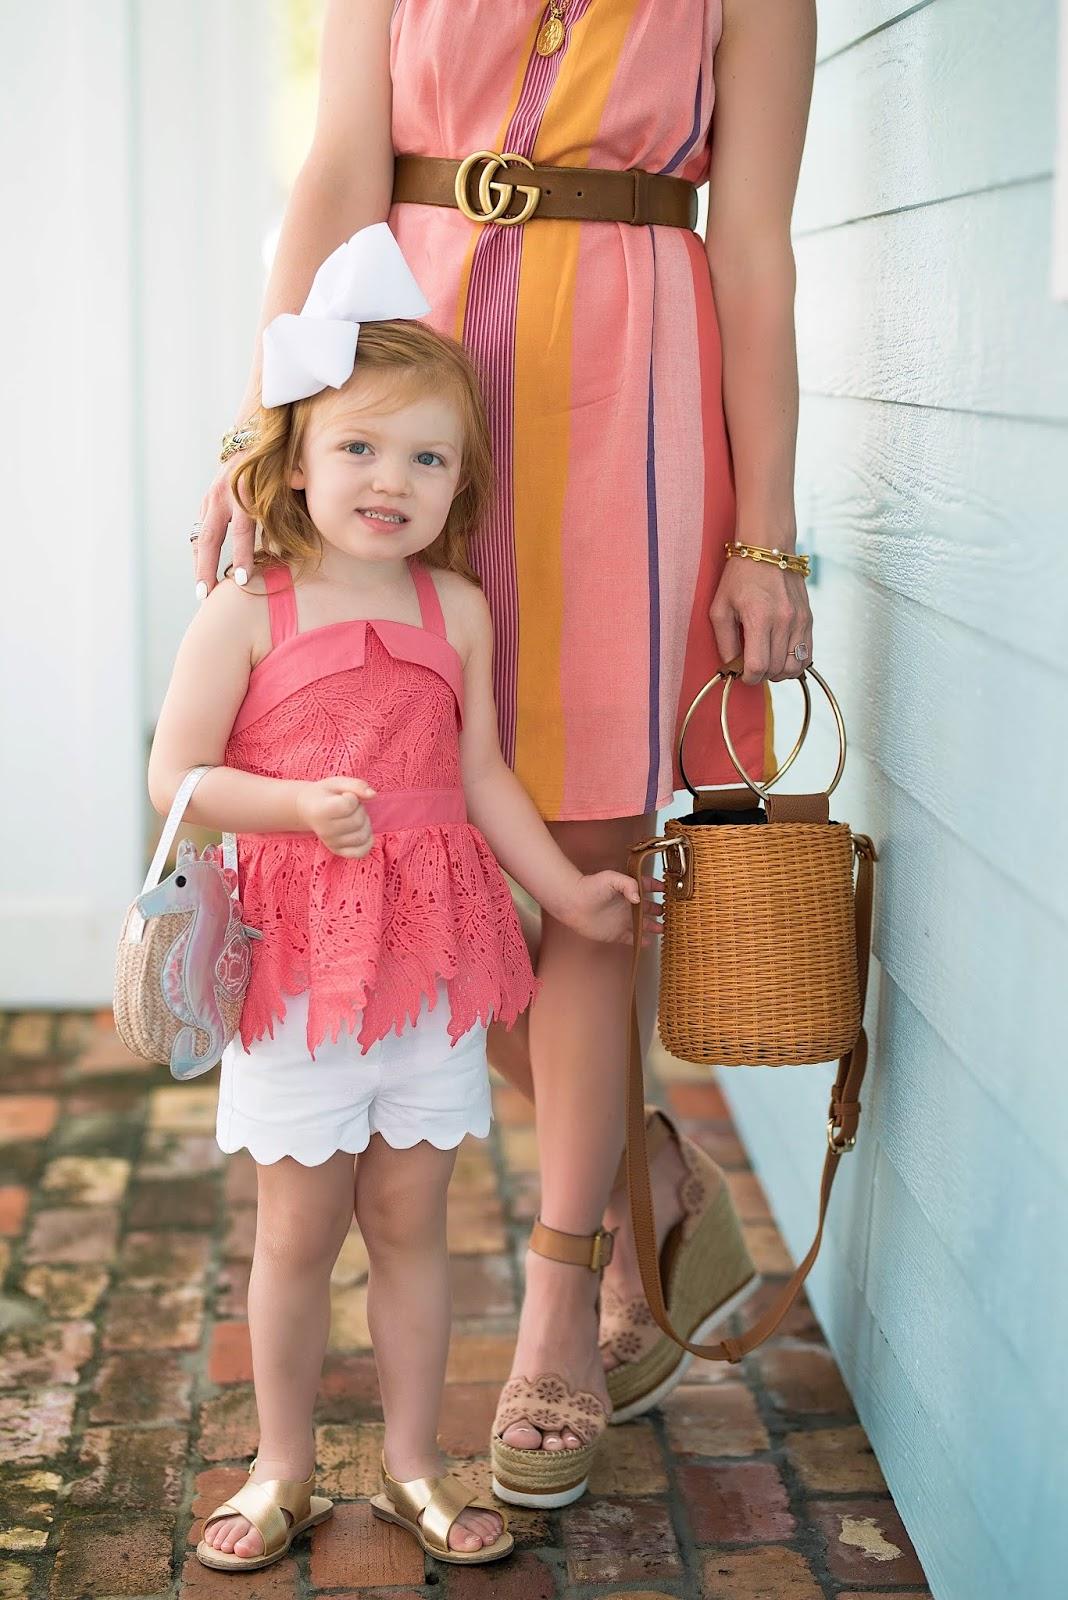 Toddler Fashion: Genuine Kids from OshKosh Toddler Girls' Lace Peplum Top - Something Delightful Blog